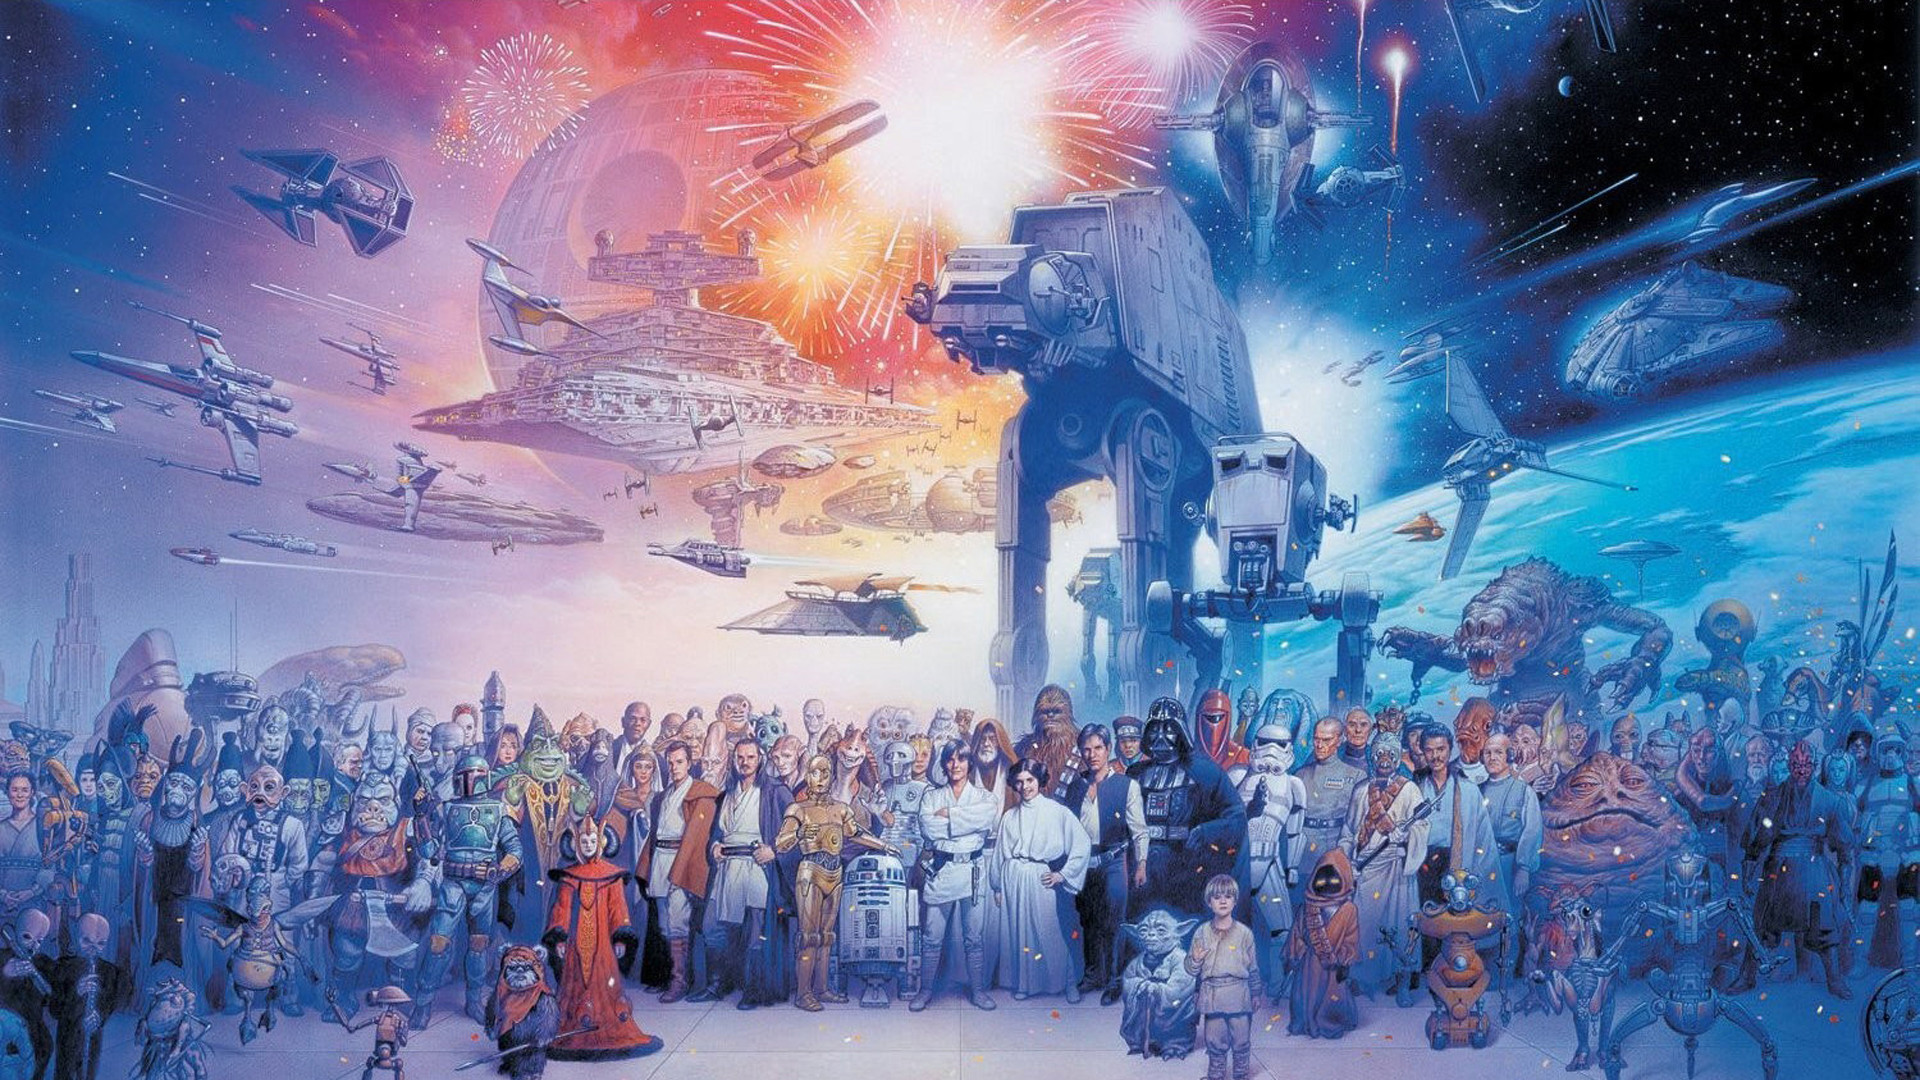 Classic Star Wars Desktop Wallpaper 51 Images